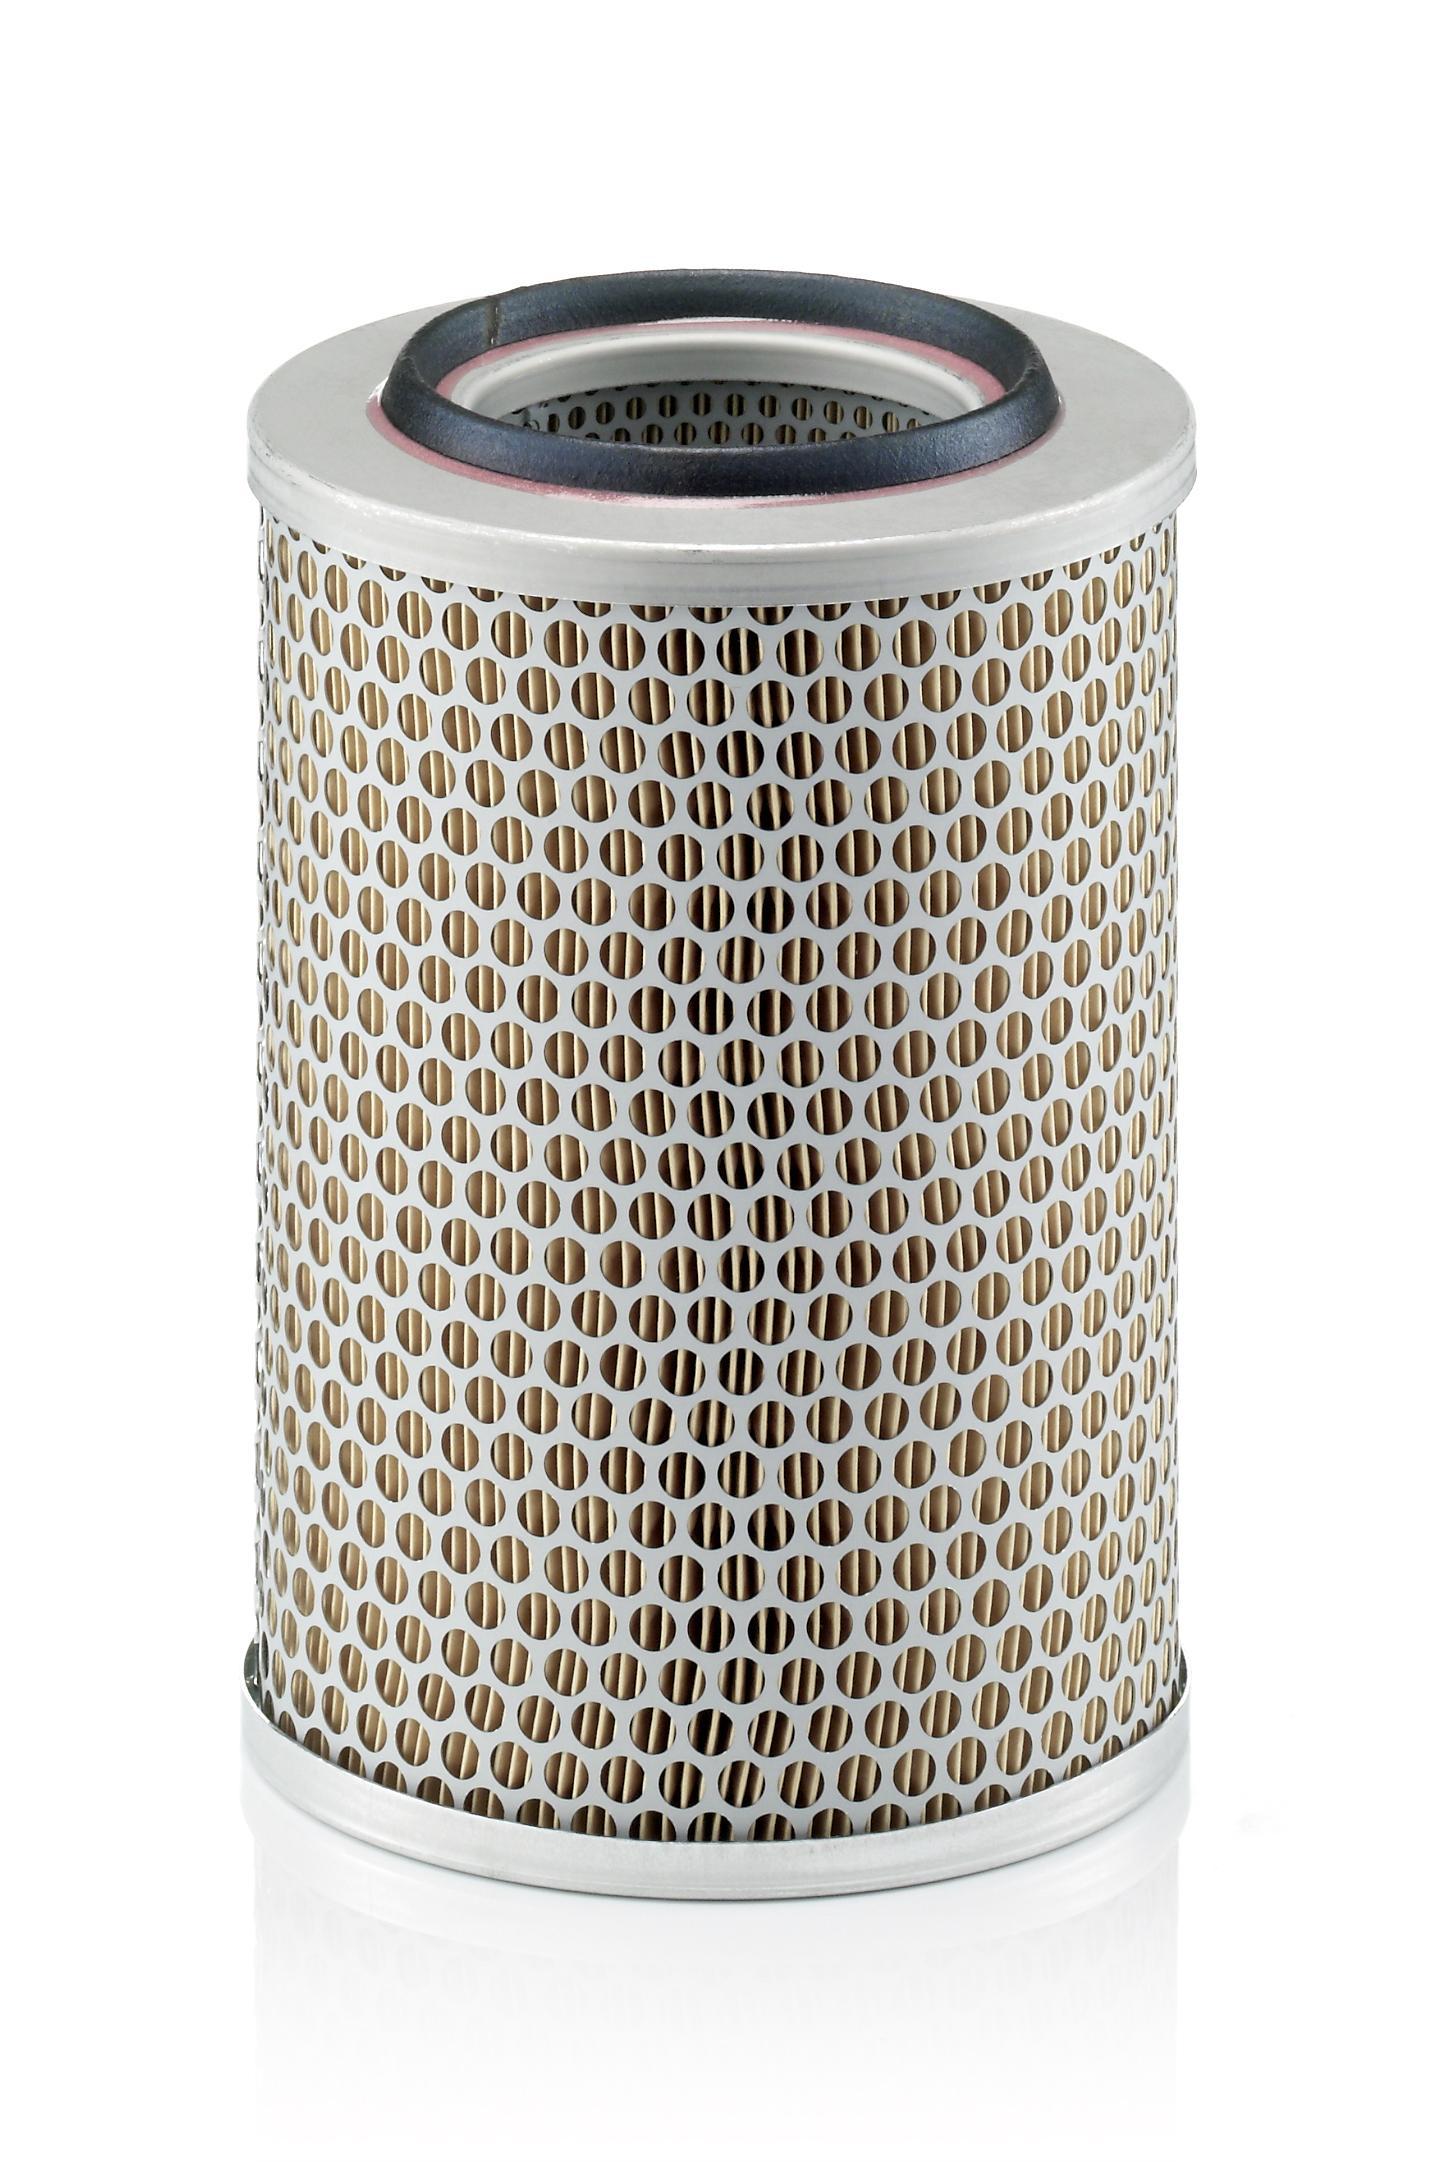 Buy original Air filter MANN-FILTER C 17 201